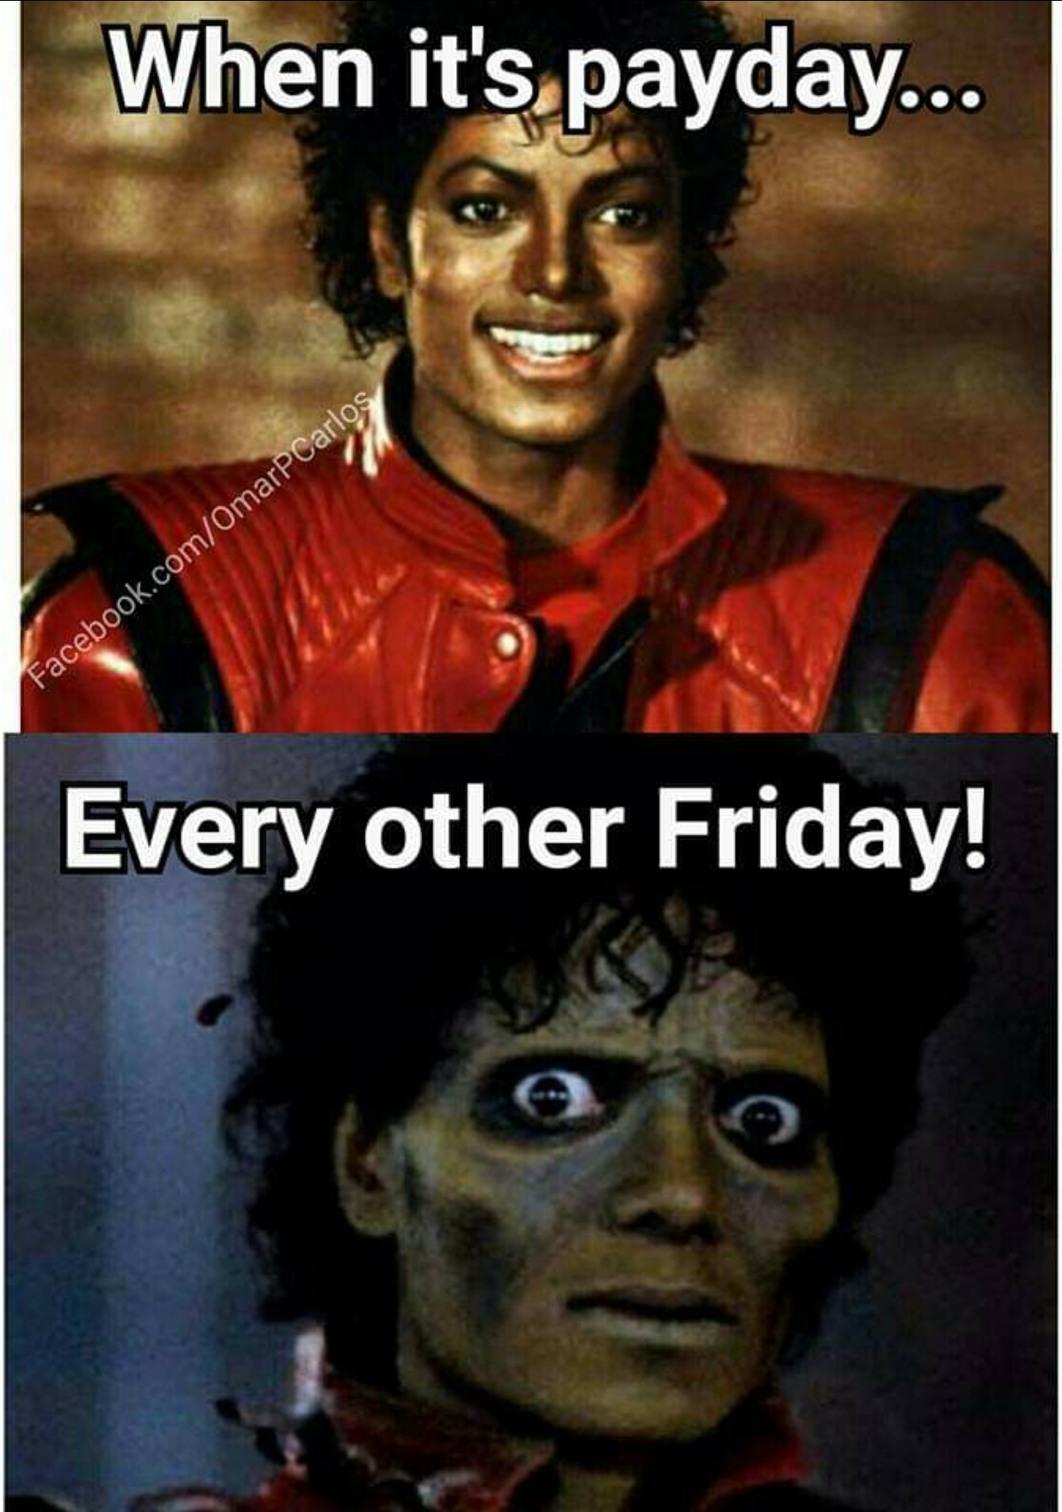 Friday Vibes! - meme